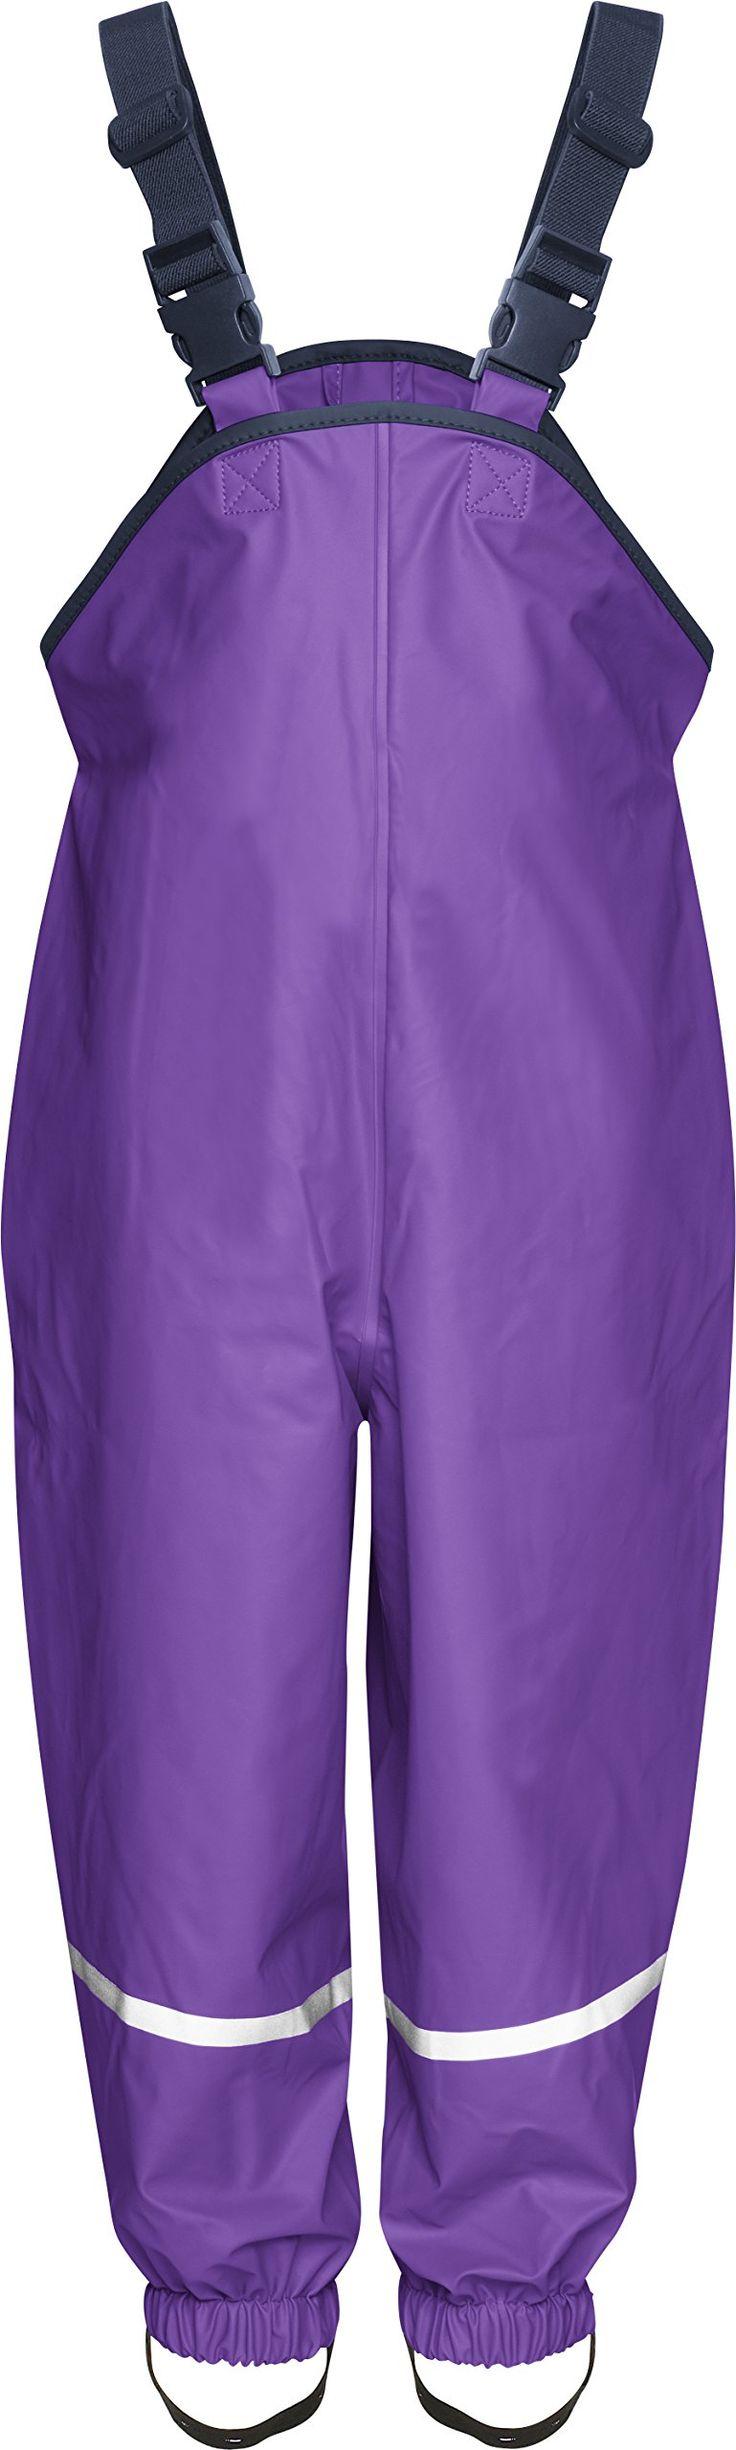 Playshoes Unisex Baby and Kids' Rain Pants 2-3 Years Purple